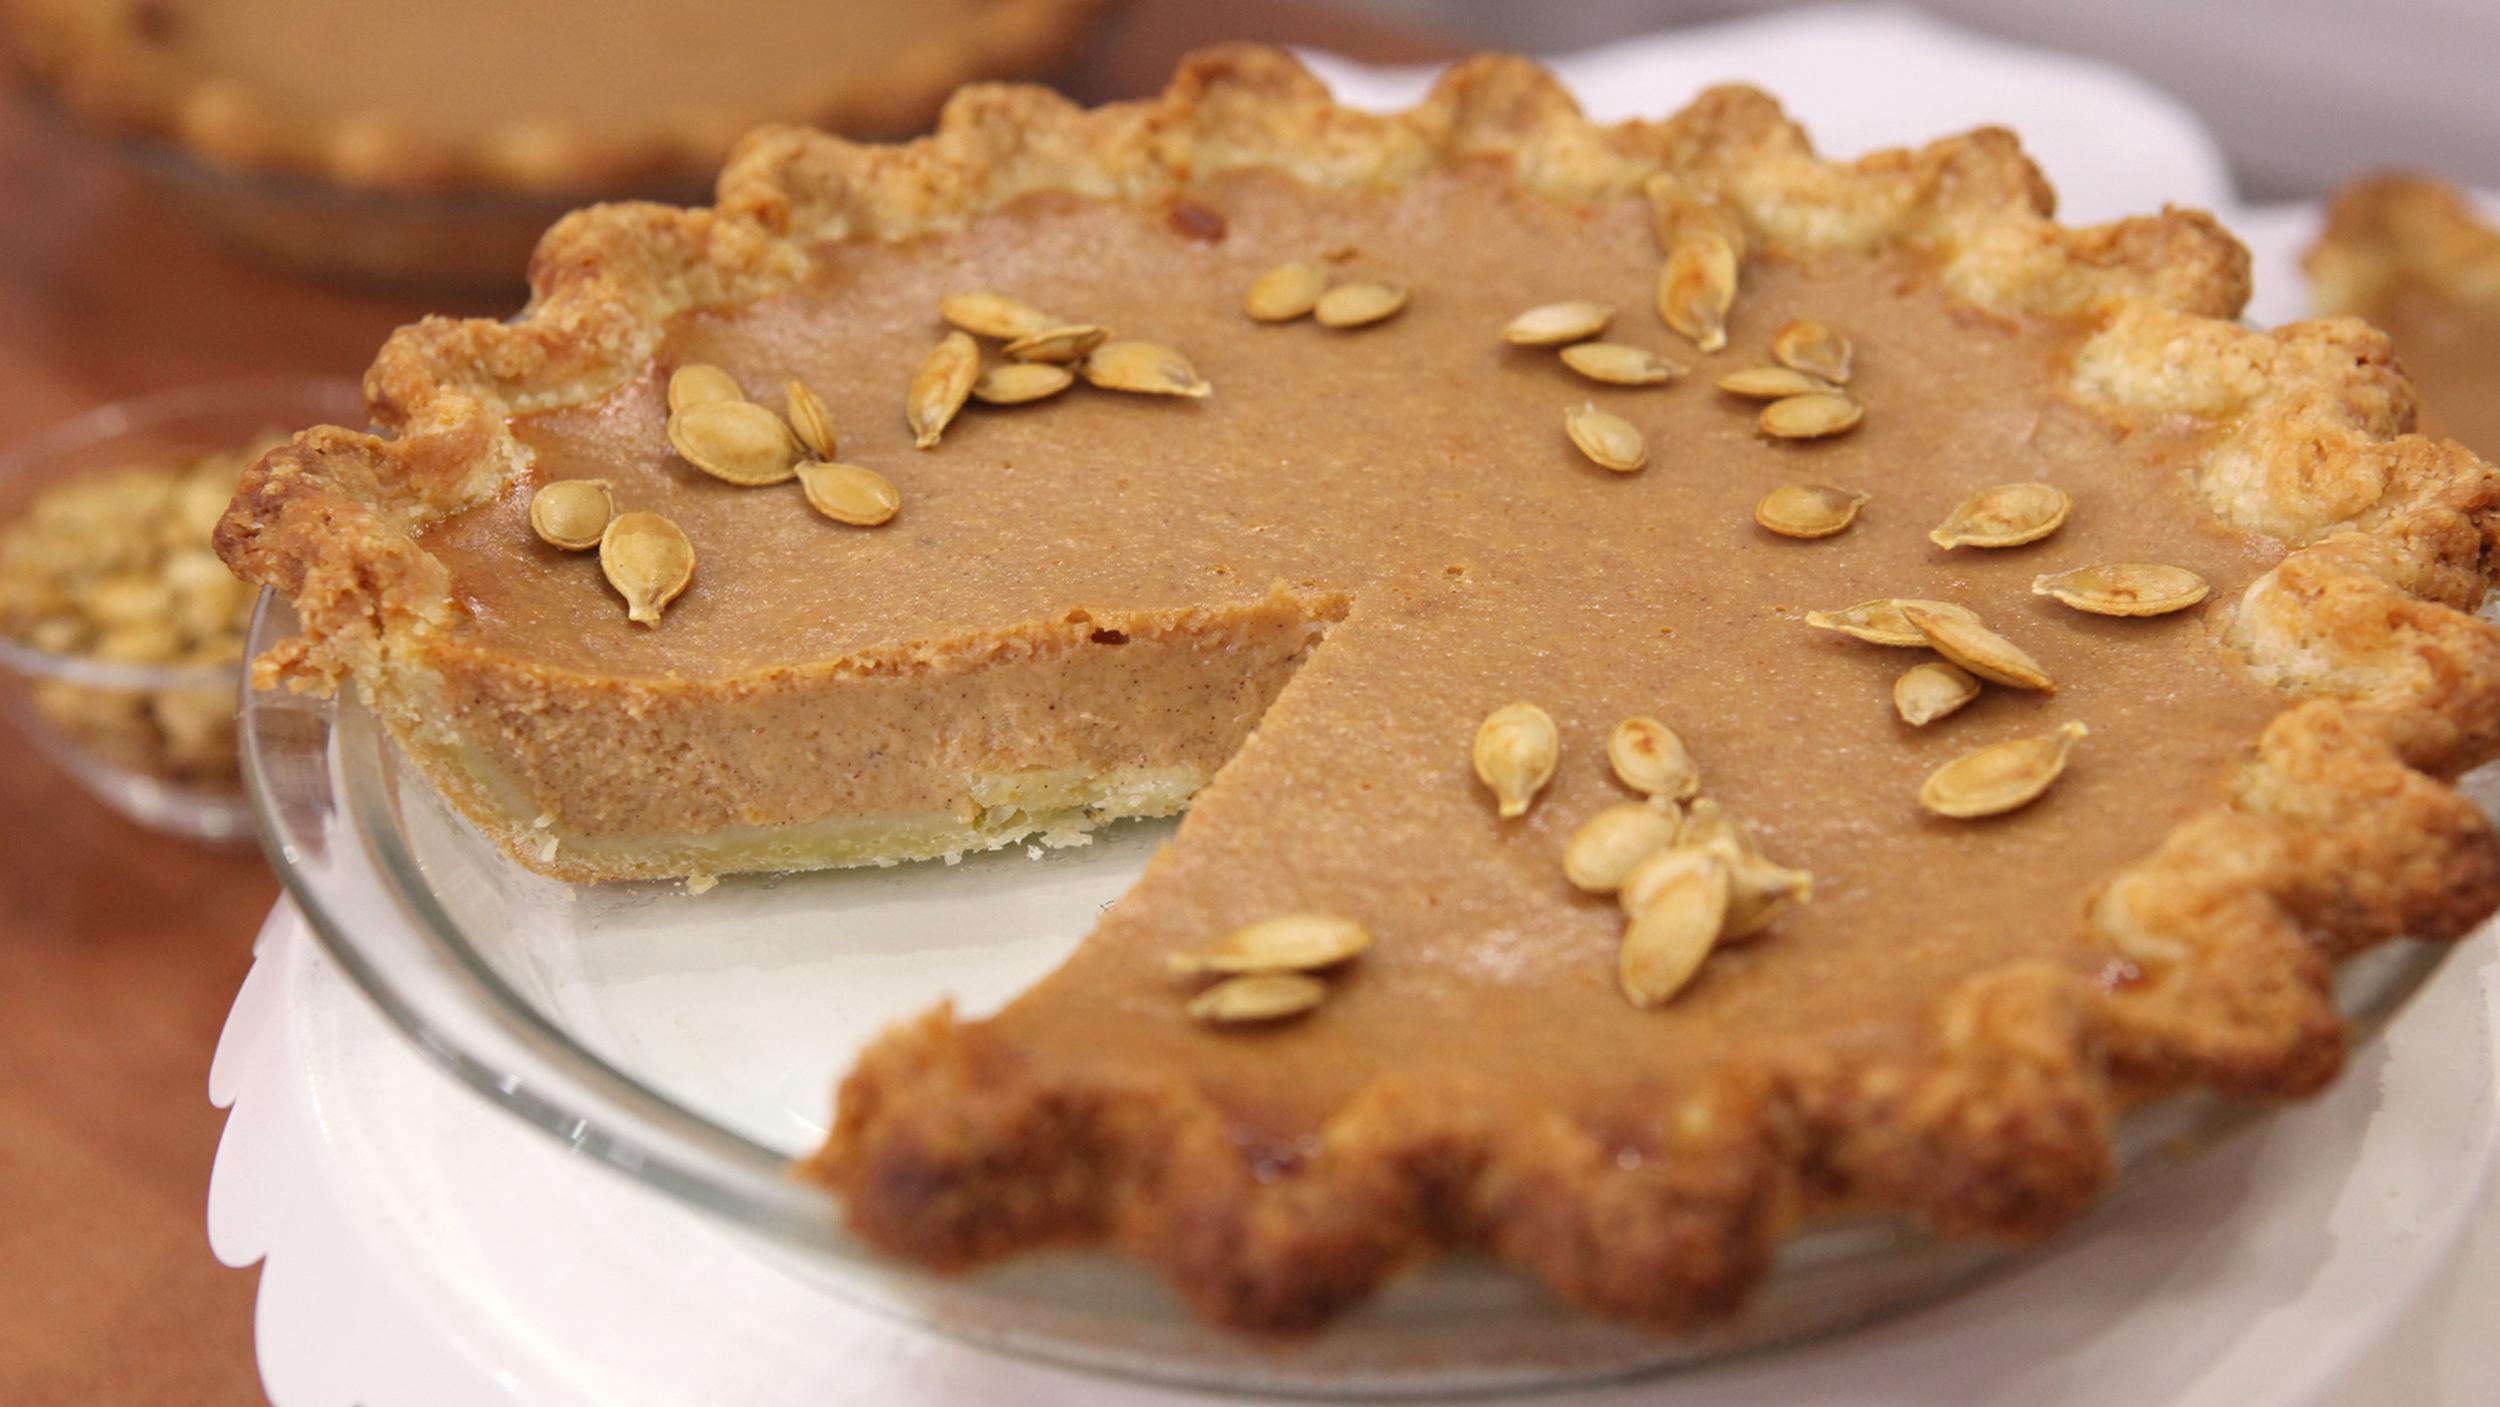 Cardamom Pecan Pie recommendations